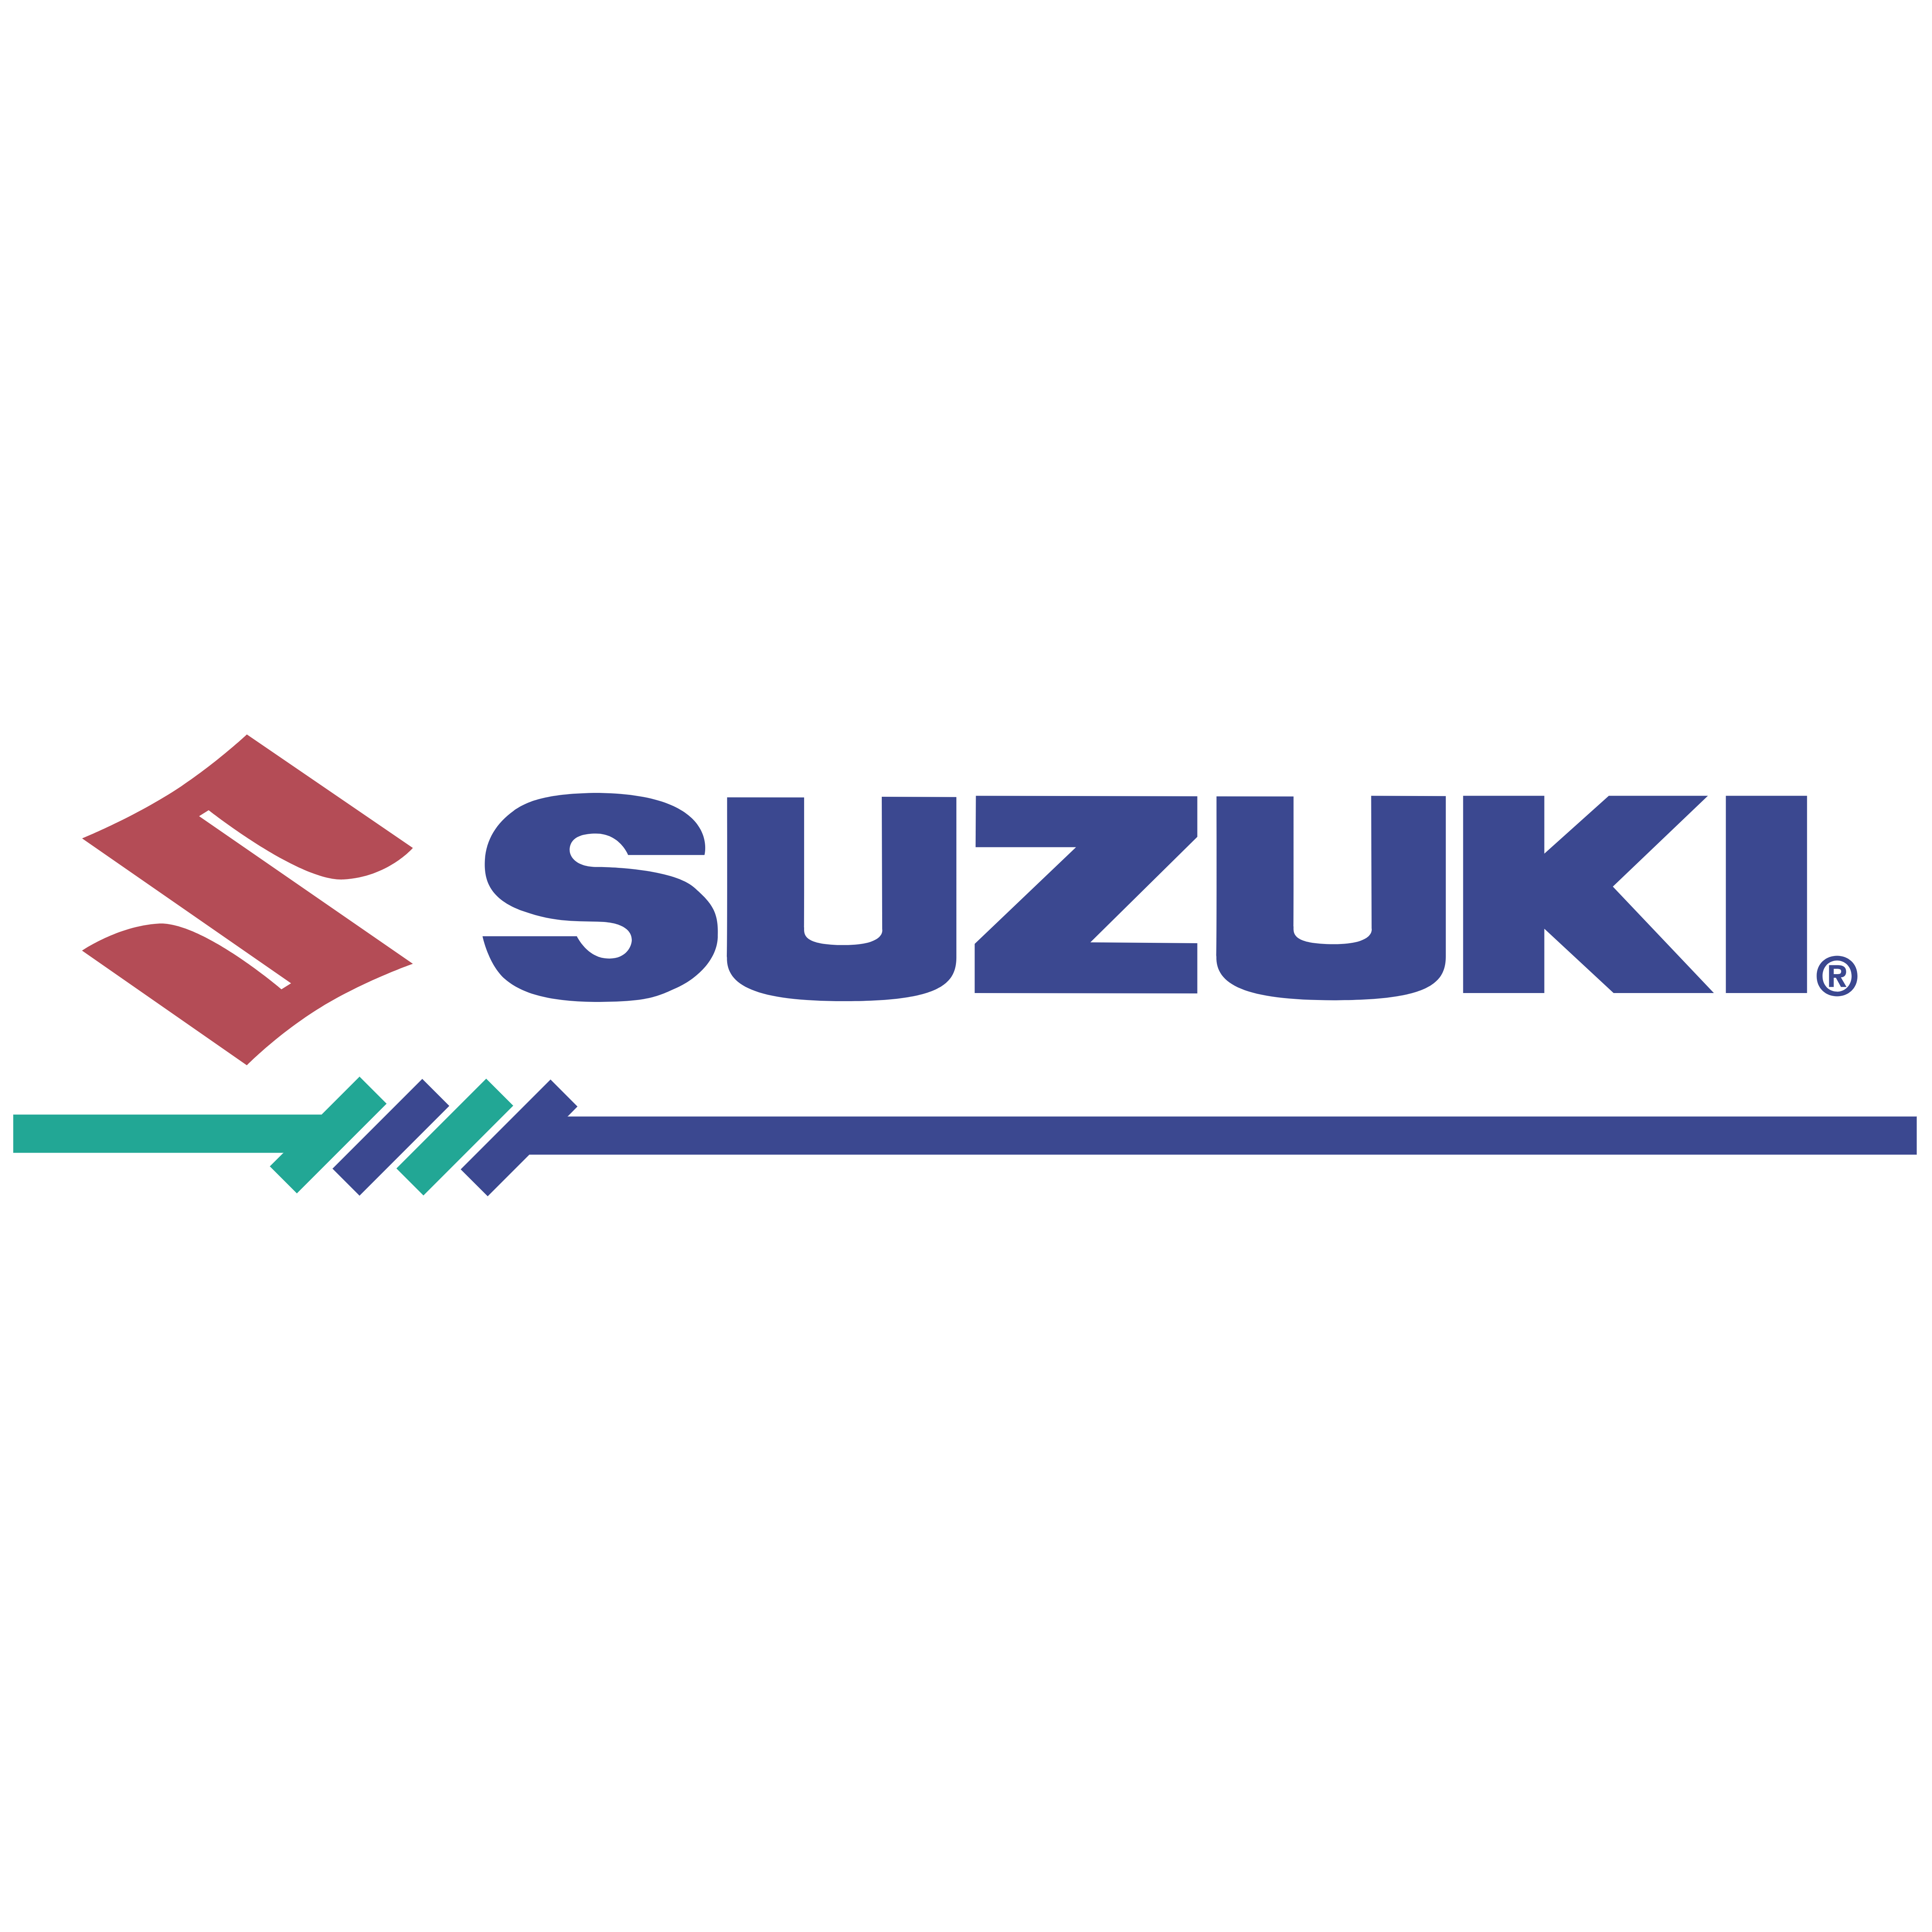 Suzuki Logos Download